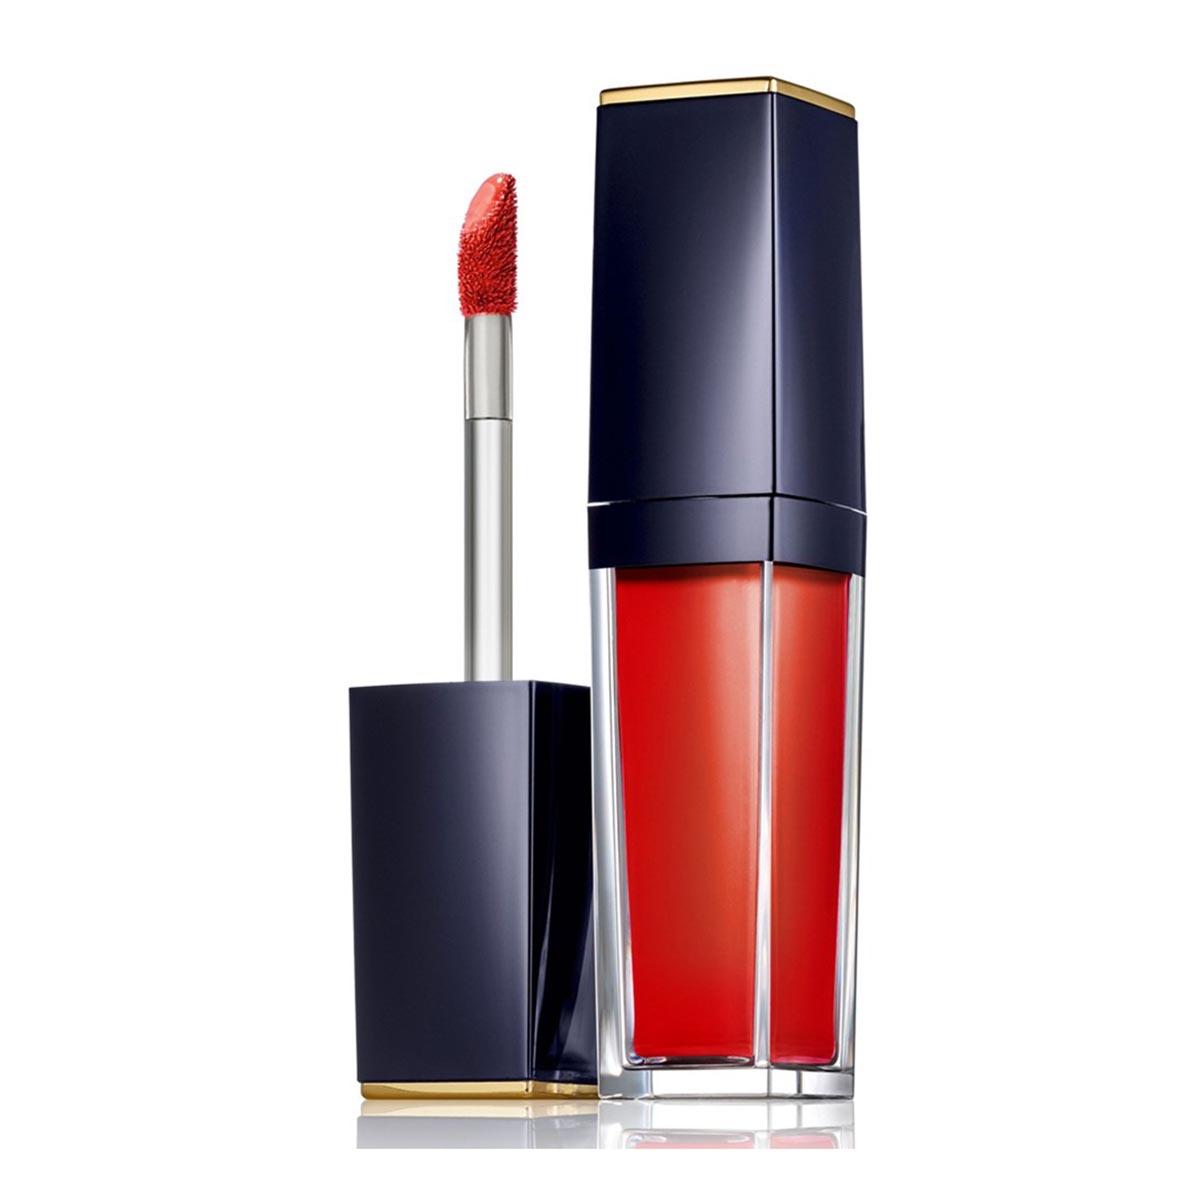 Estee lauder pure color envy liquid lipstick poppy sauvage